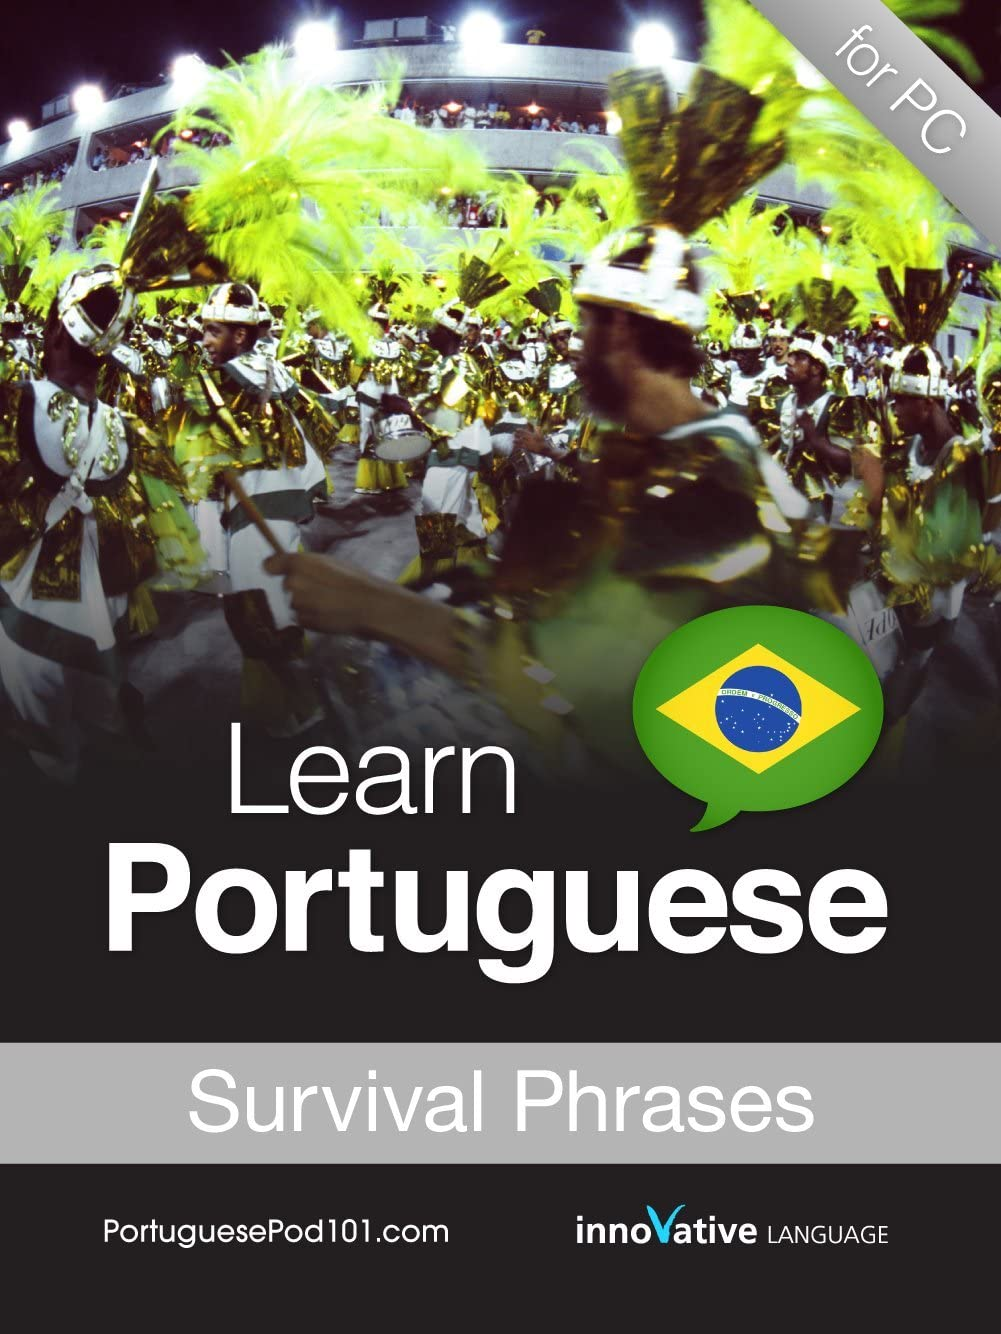 Learn Portuguese Philadelphia Mall - Very popular Survival Phrases Course Audio Download